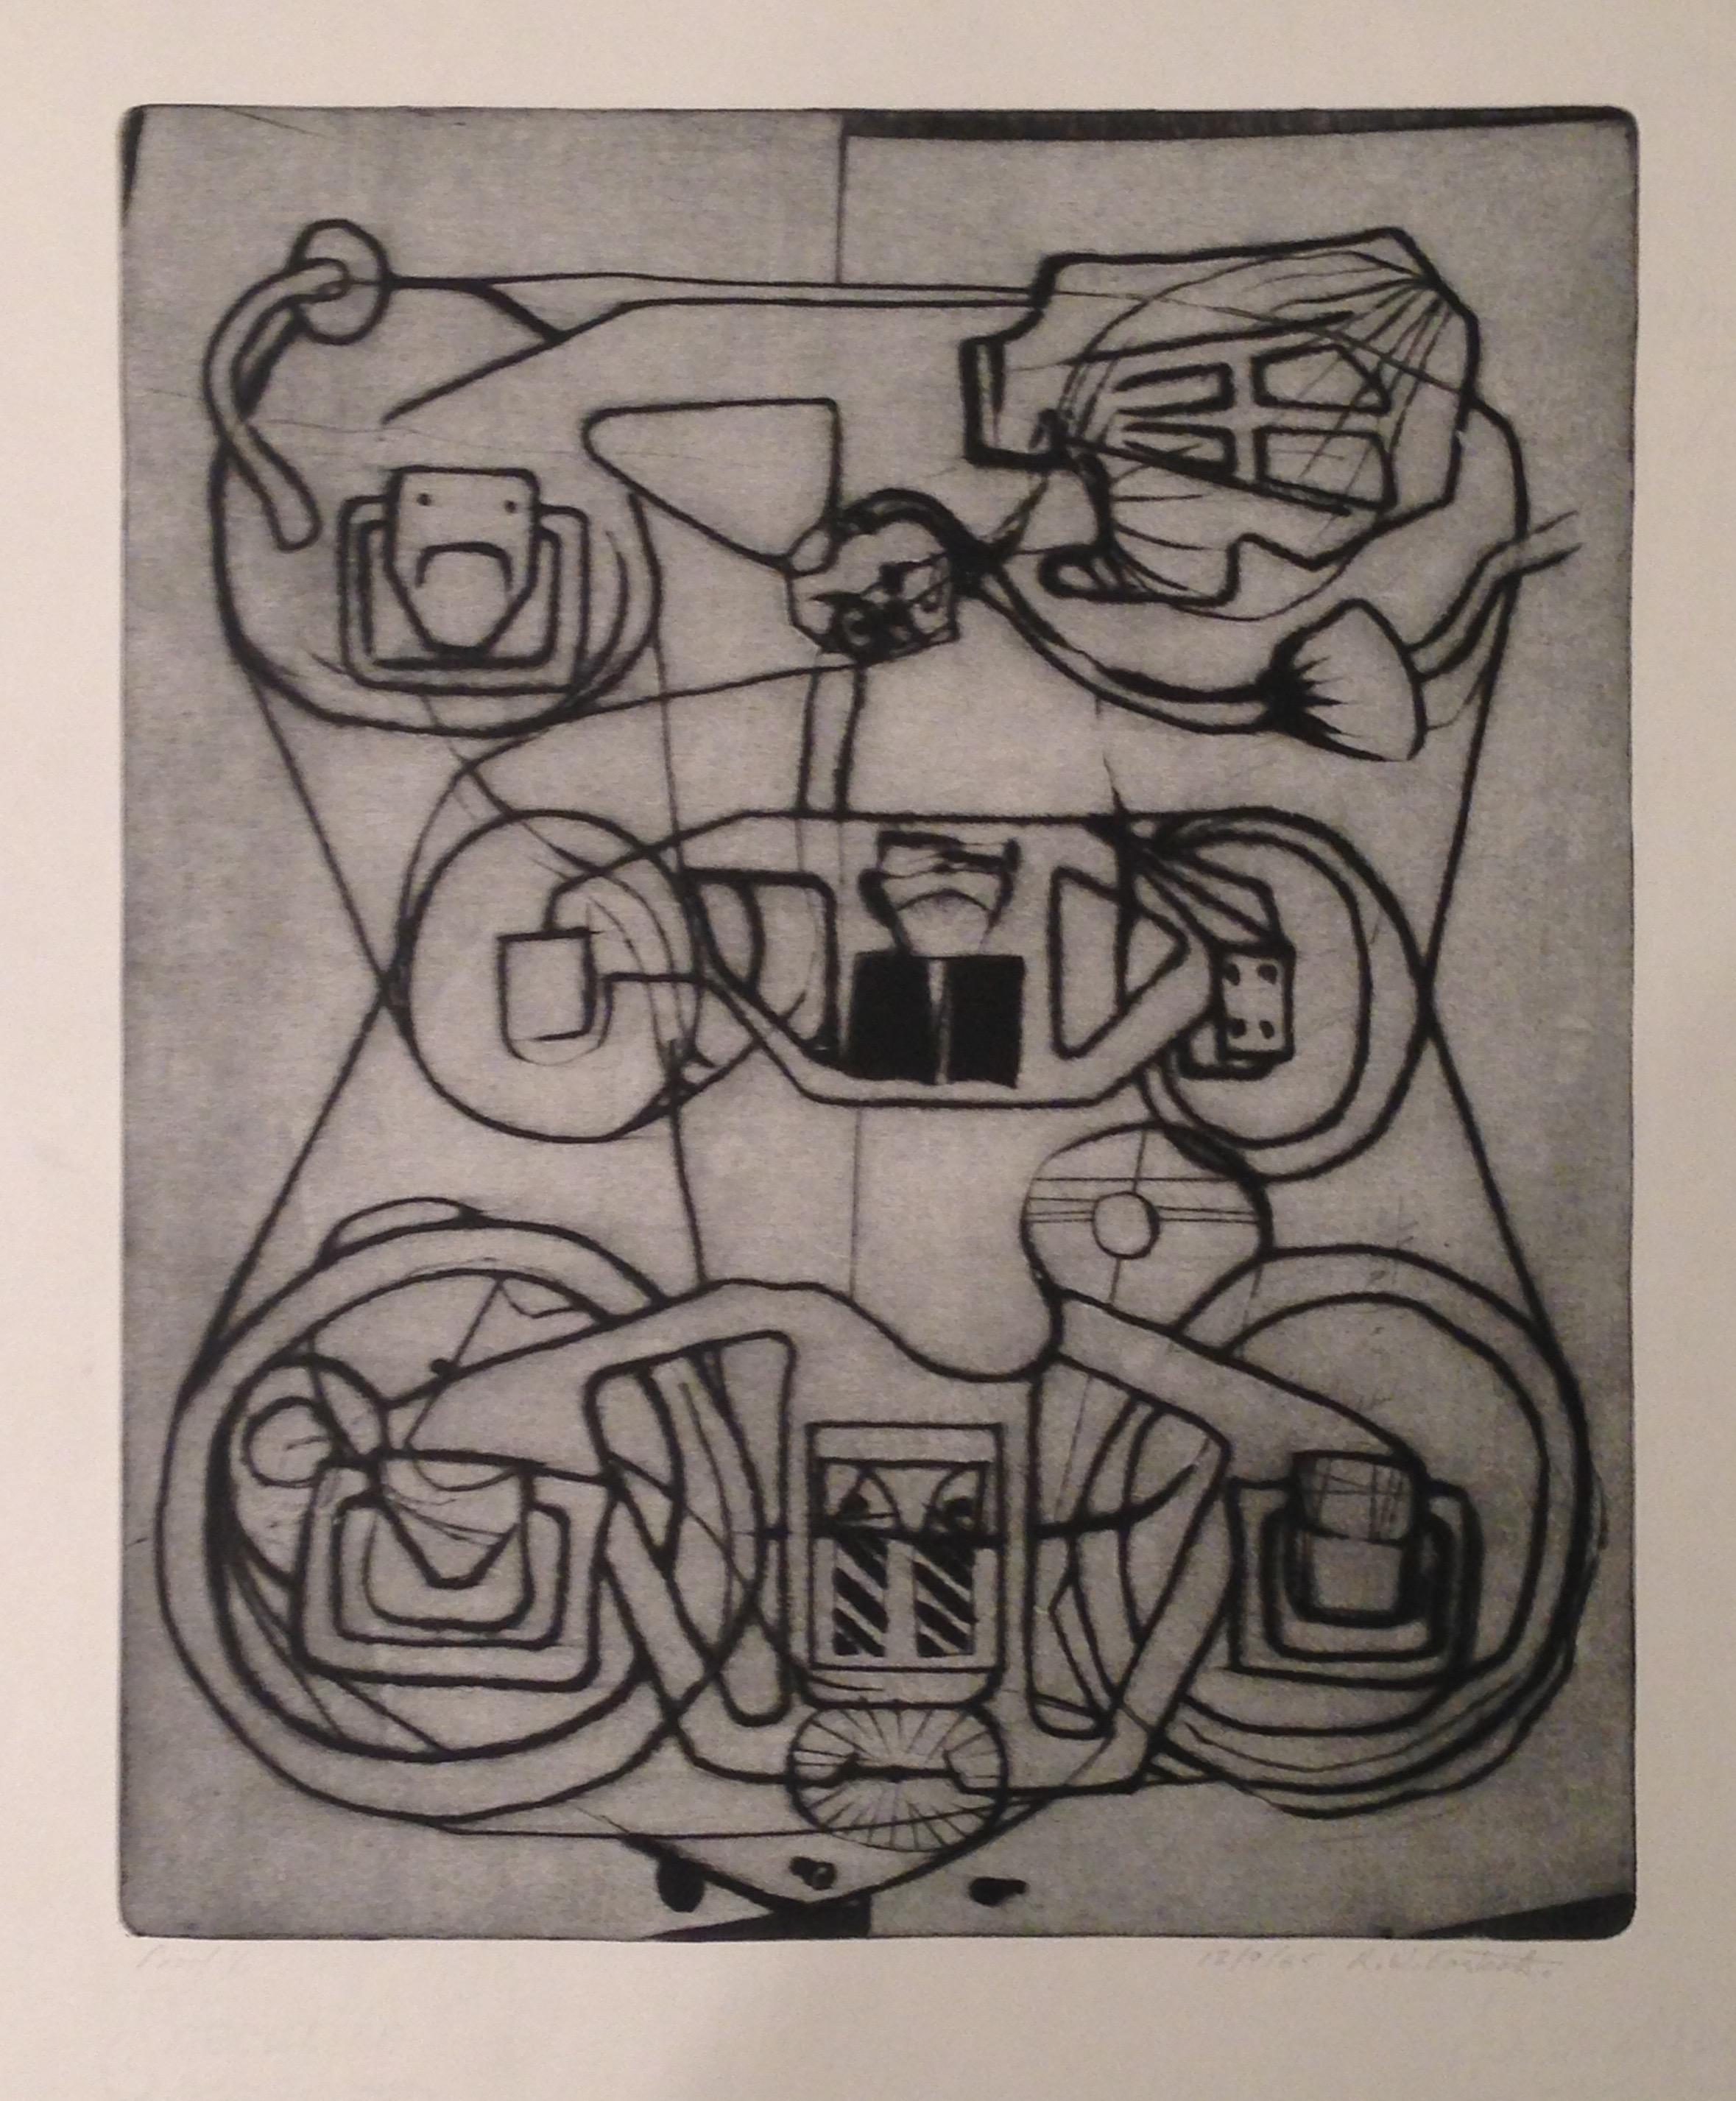 Wayne Eastcott, Untitled (abstract machine), 1965